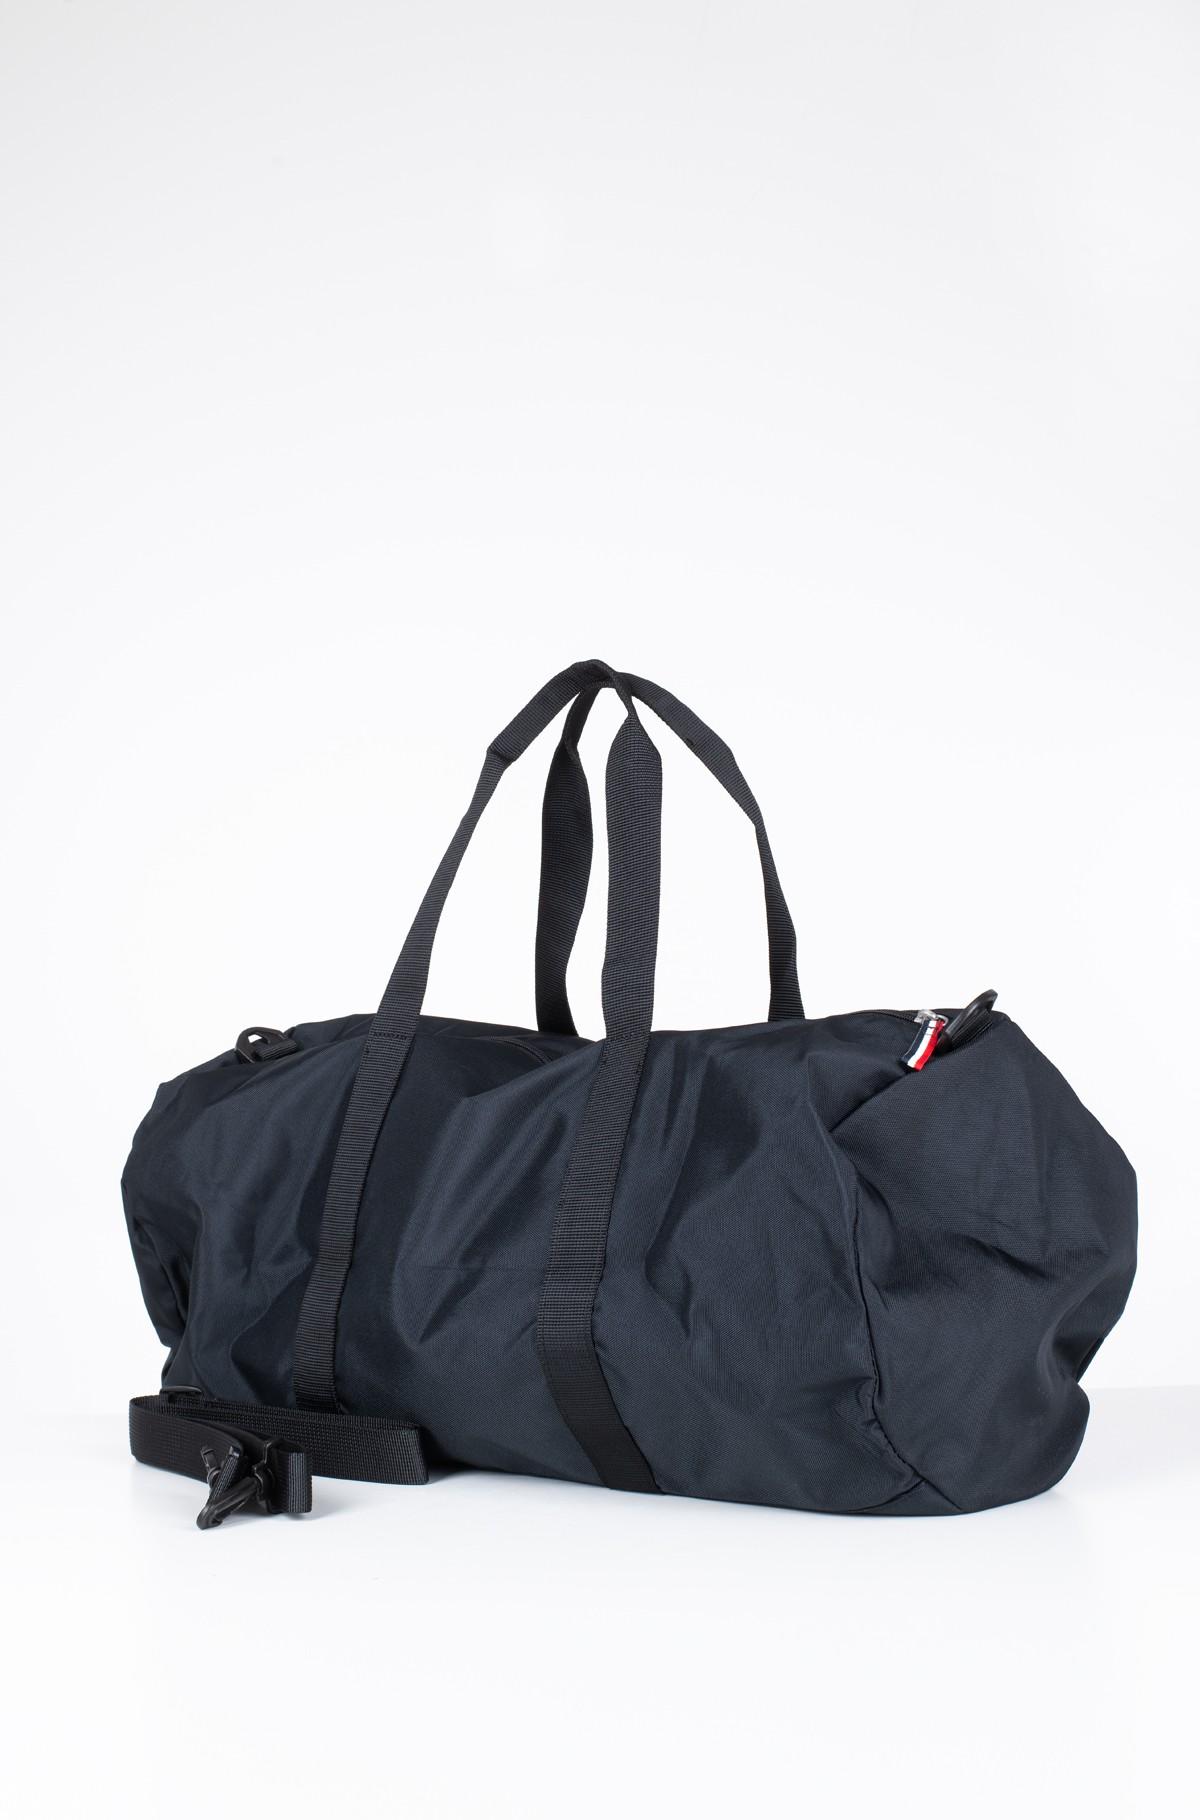 Kelionių krepšys TJM COOL CITY DUFFLE-full-2